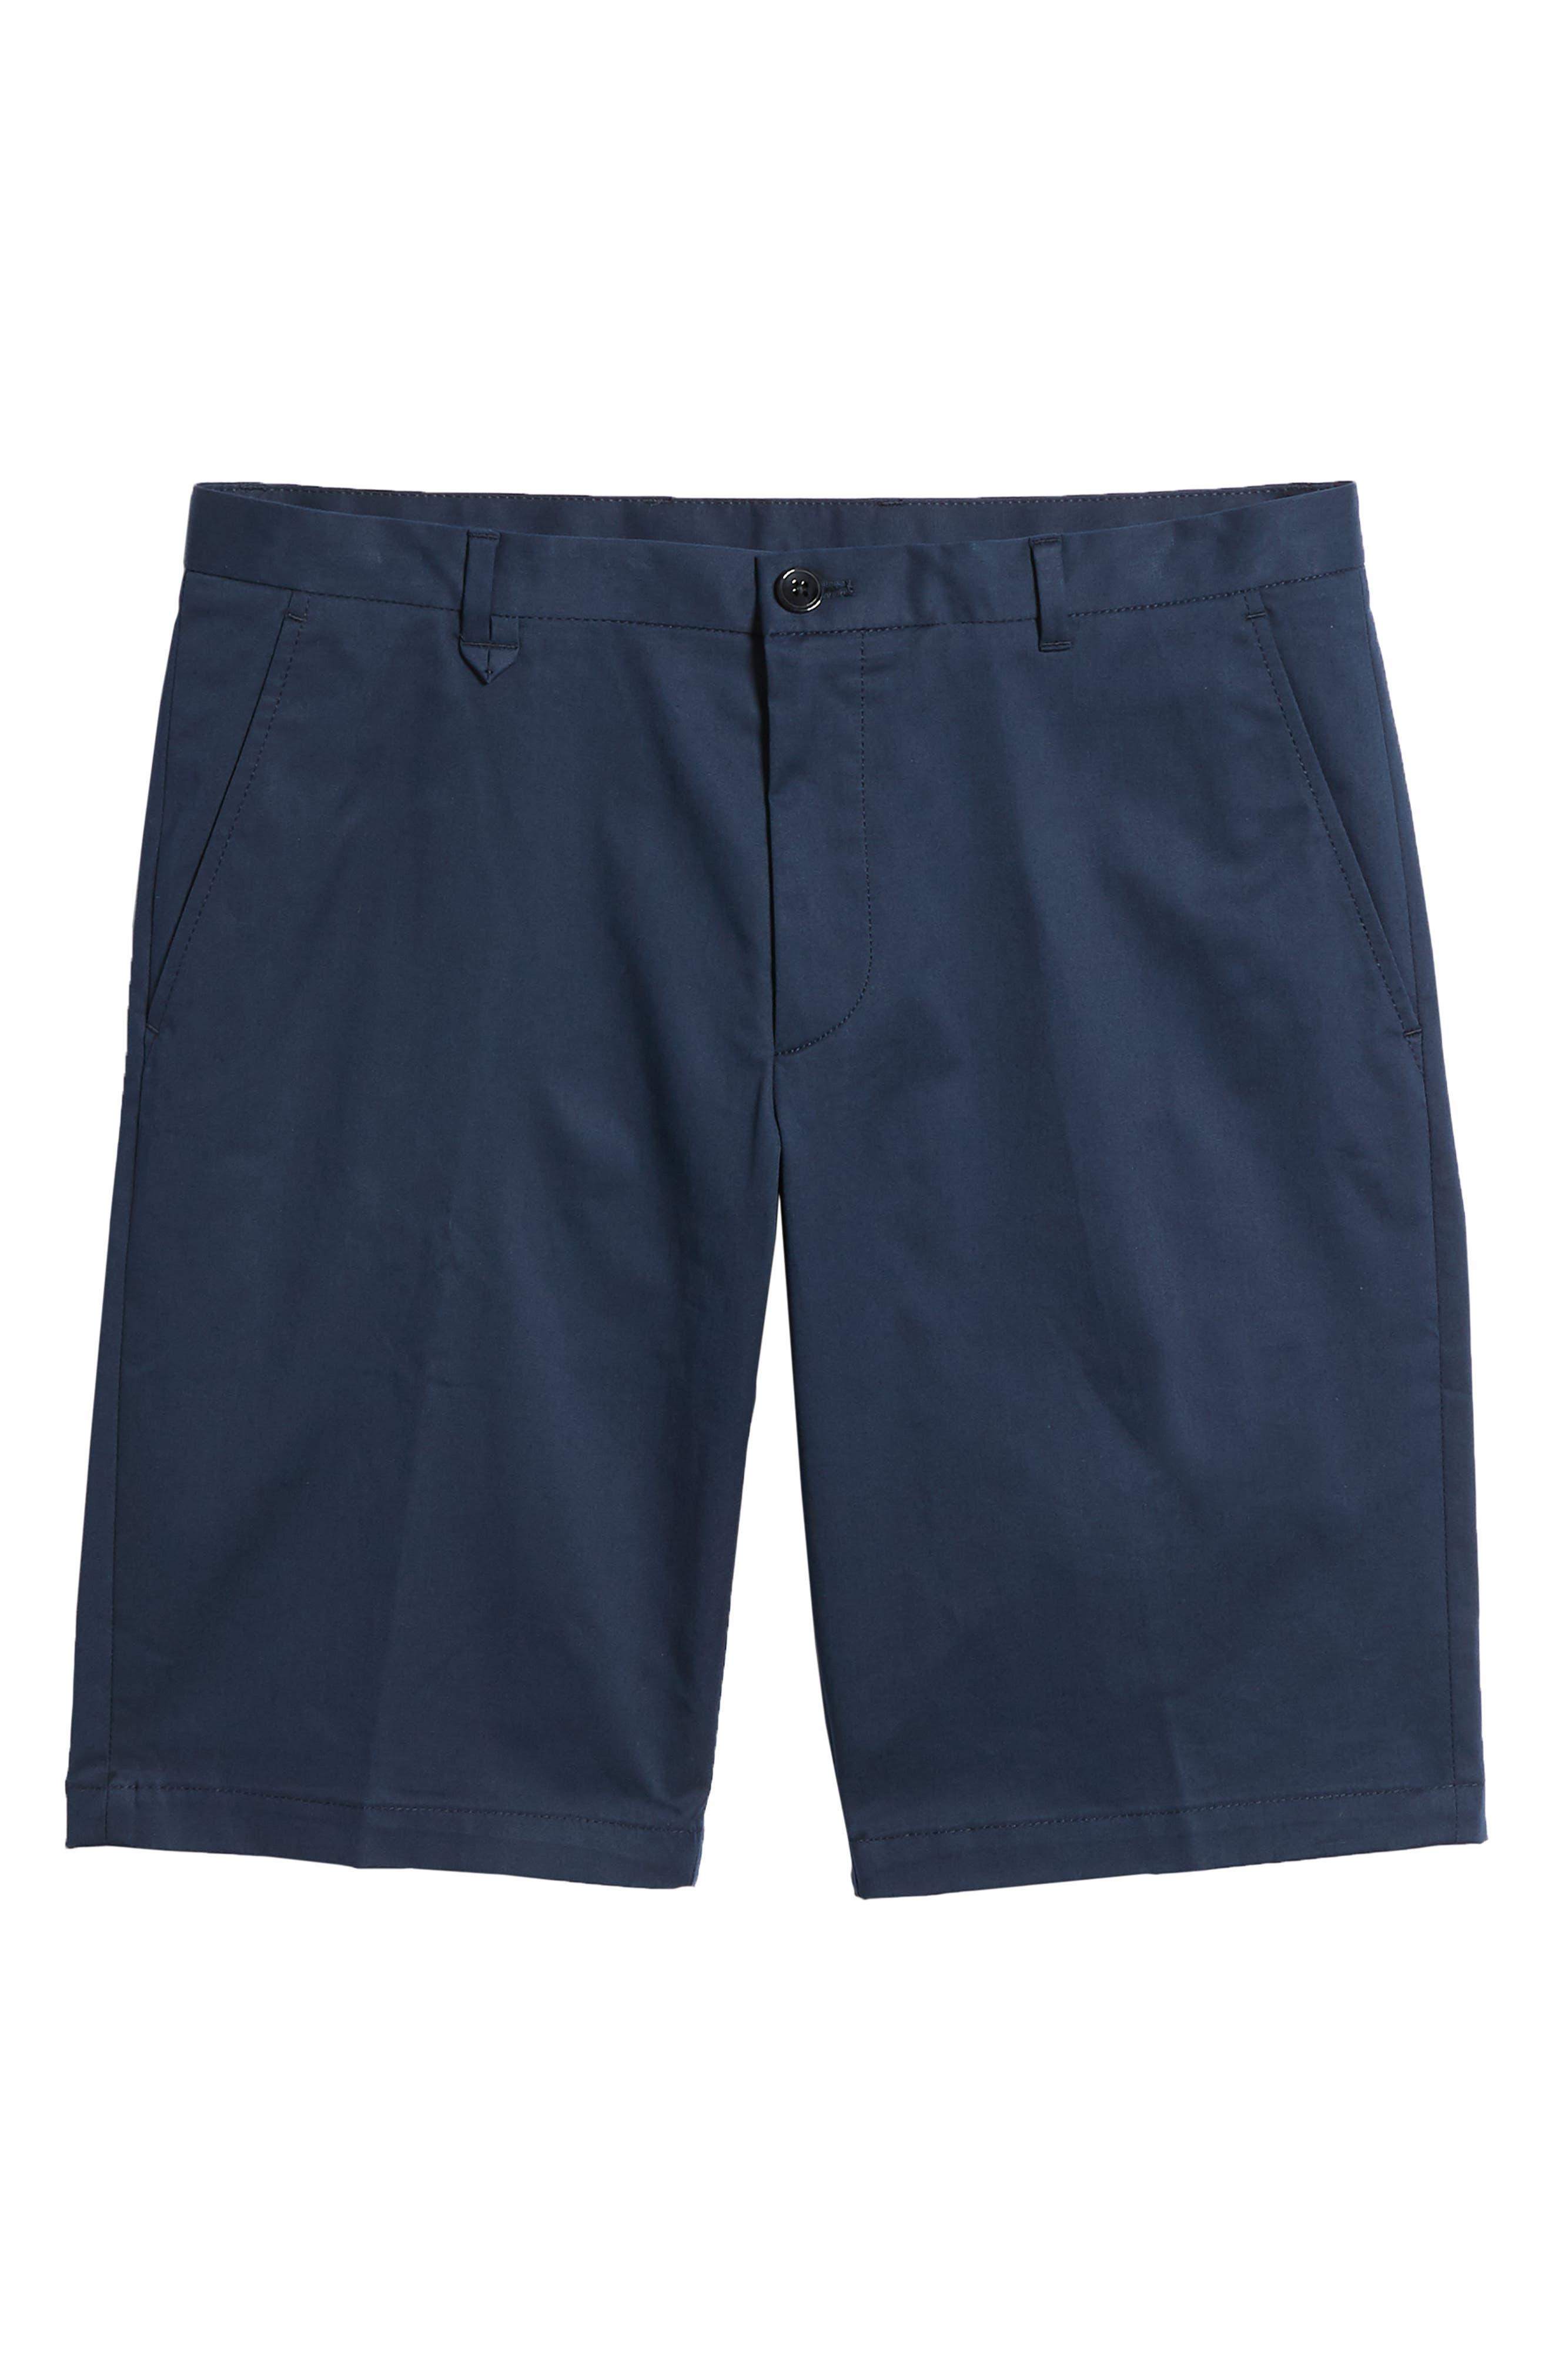 Hano Flat Front Shorts,                             Alternate thumbnail 6, color,                             Blue